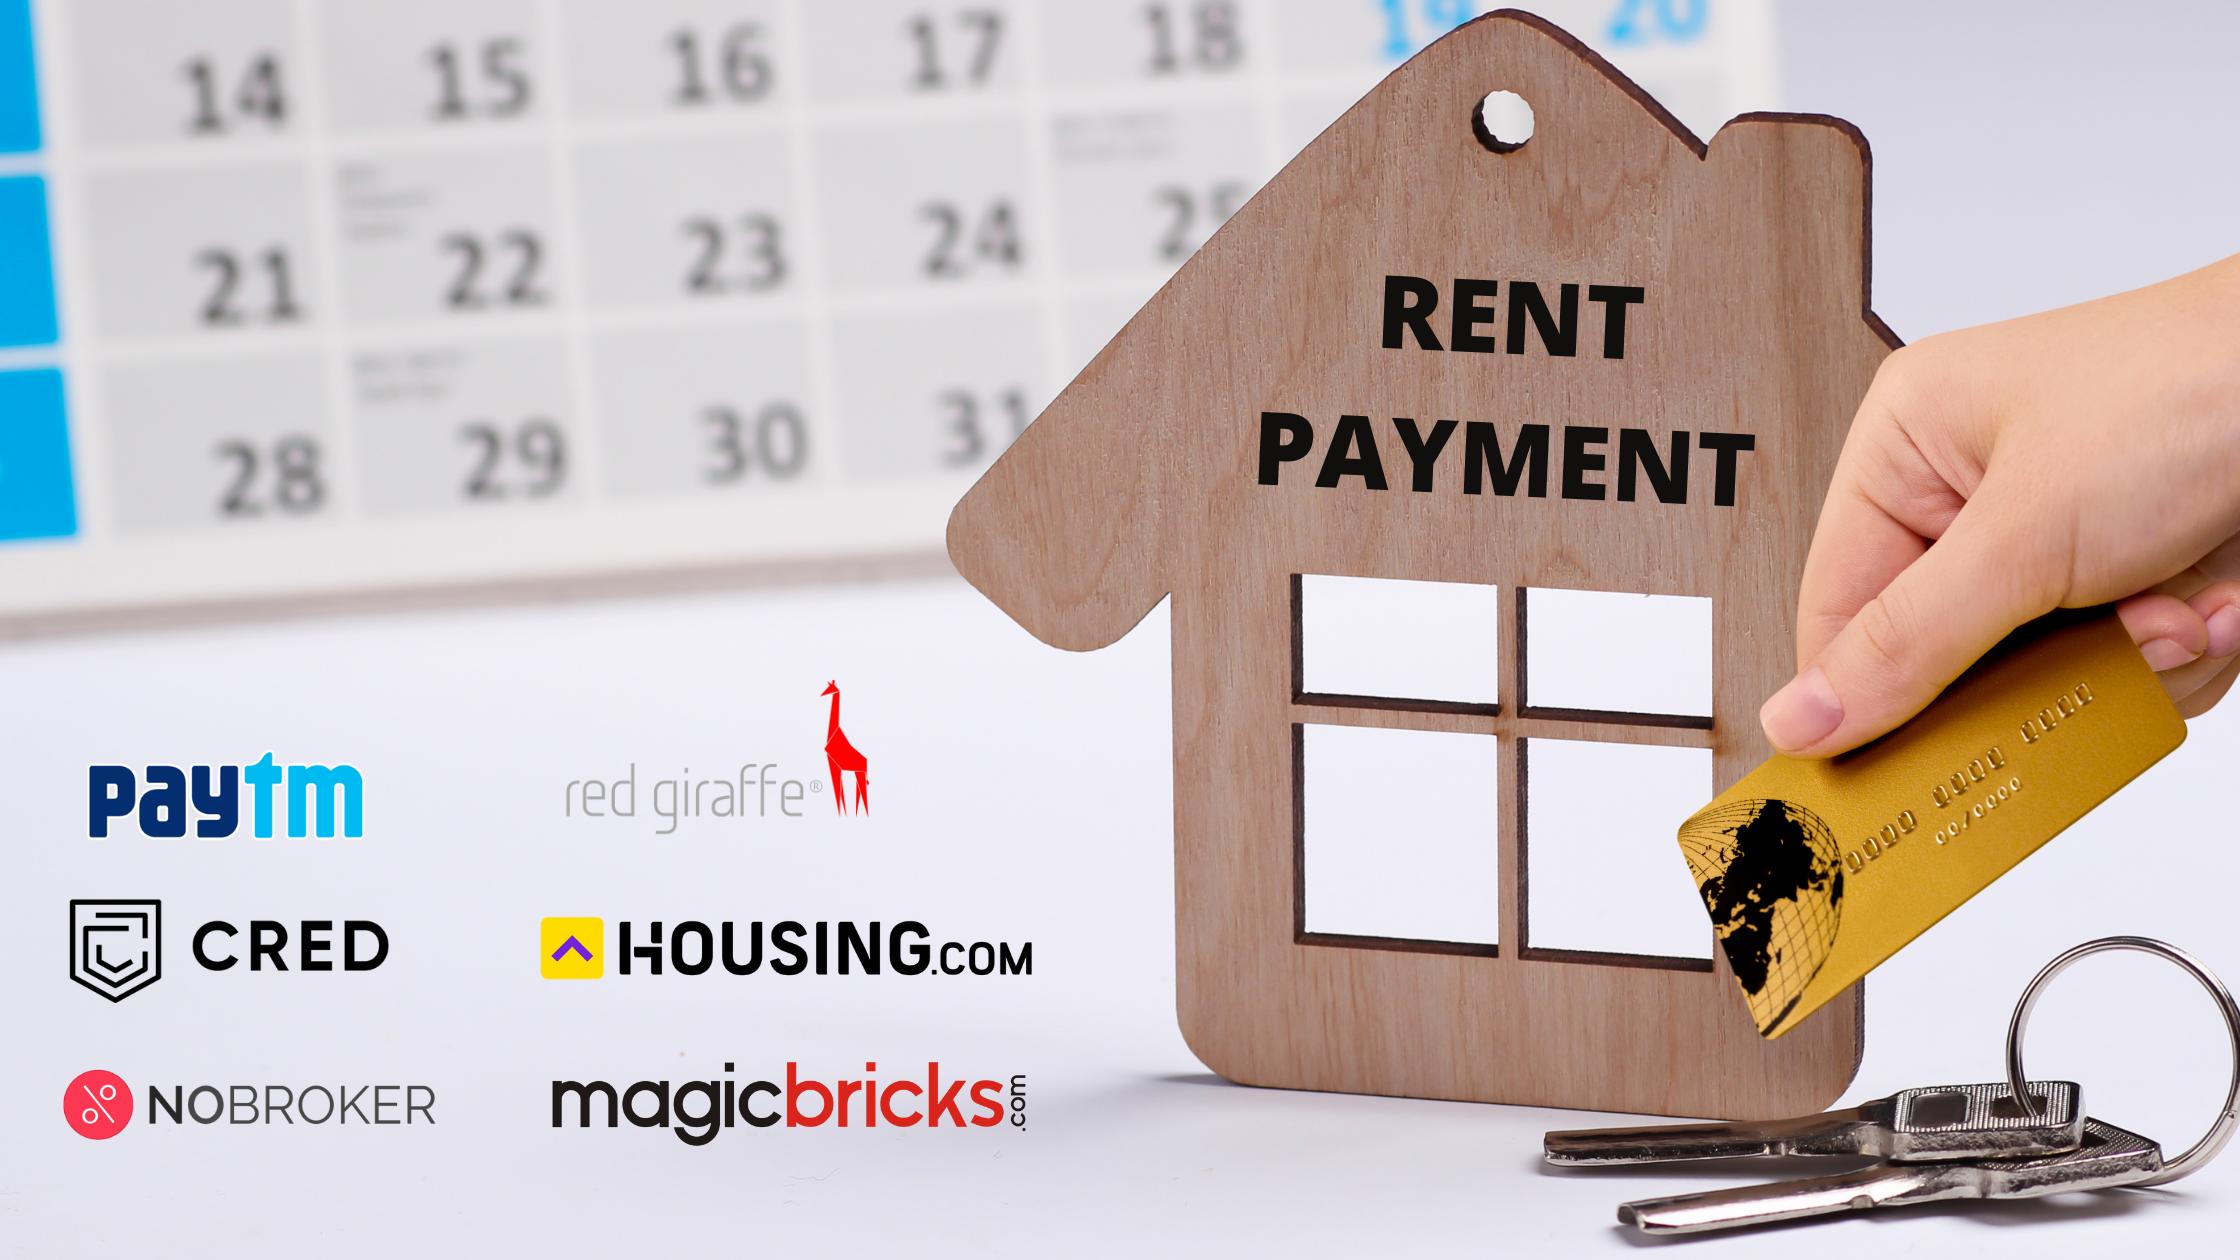 Rent Payment via Credit Cards